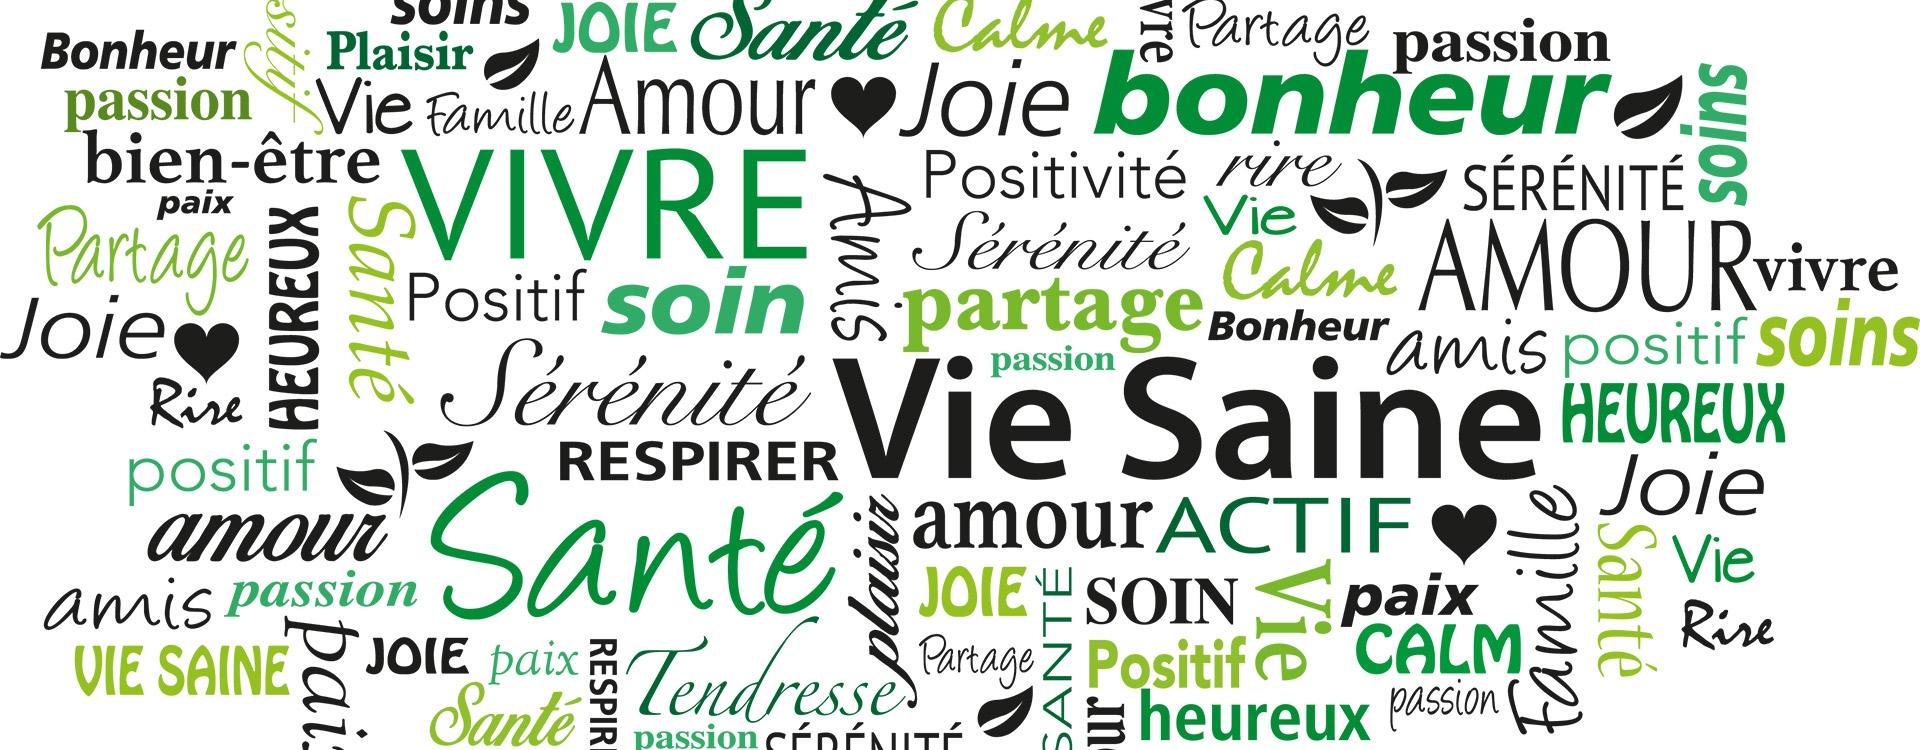 Les bizarreries de la langue française (B1-B2)